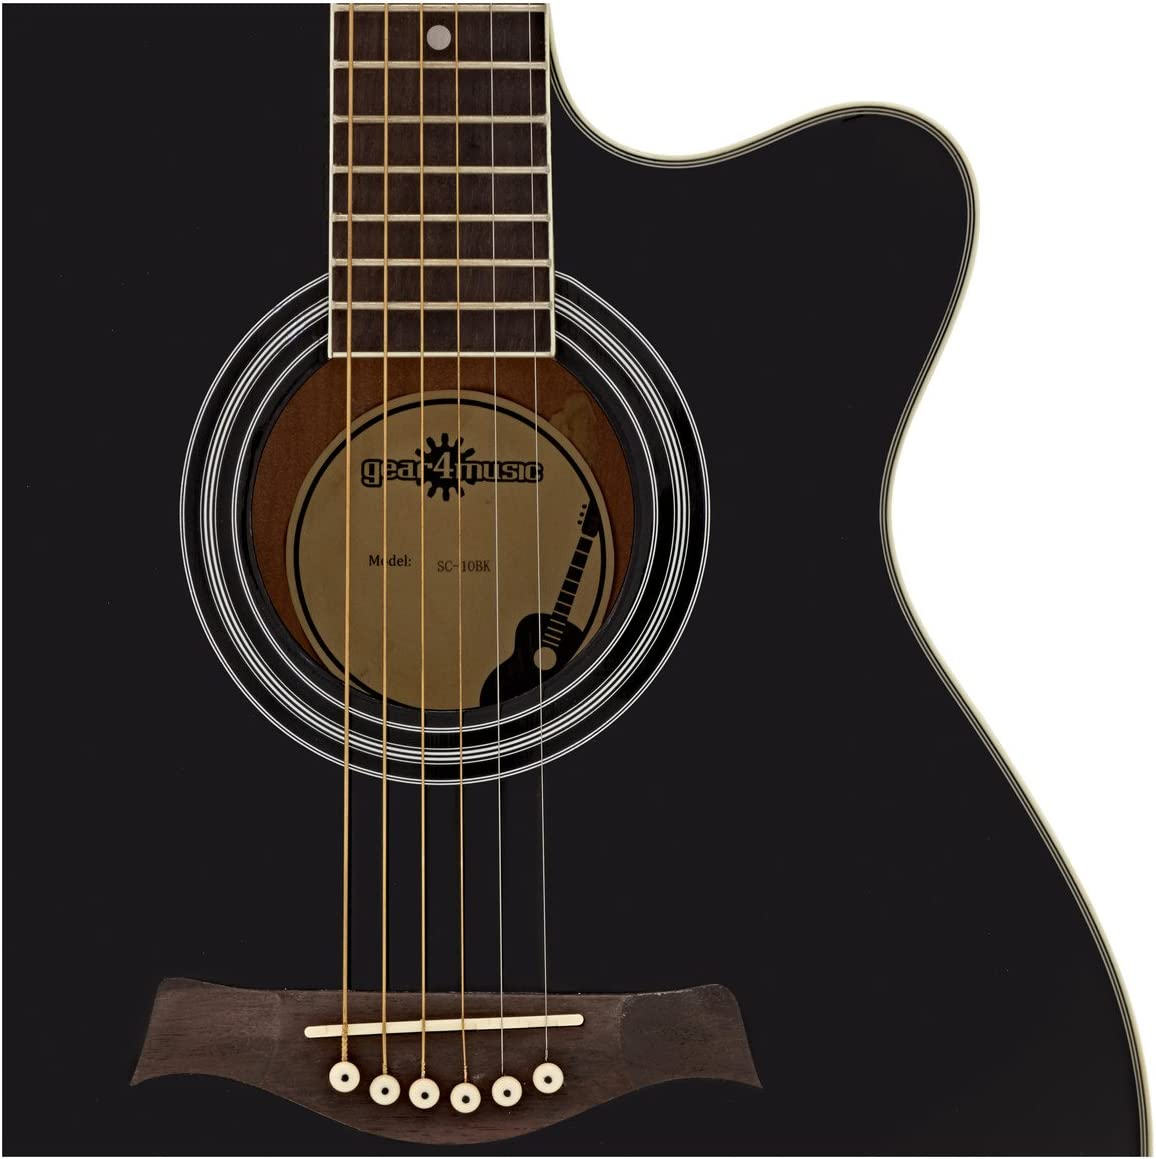 Pack de Guitarra Acustica Single Cutaway de Gear4music - Negro ...